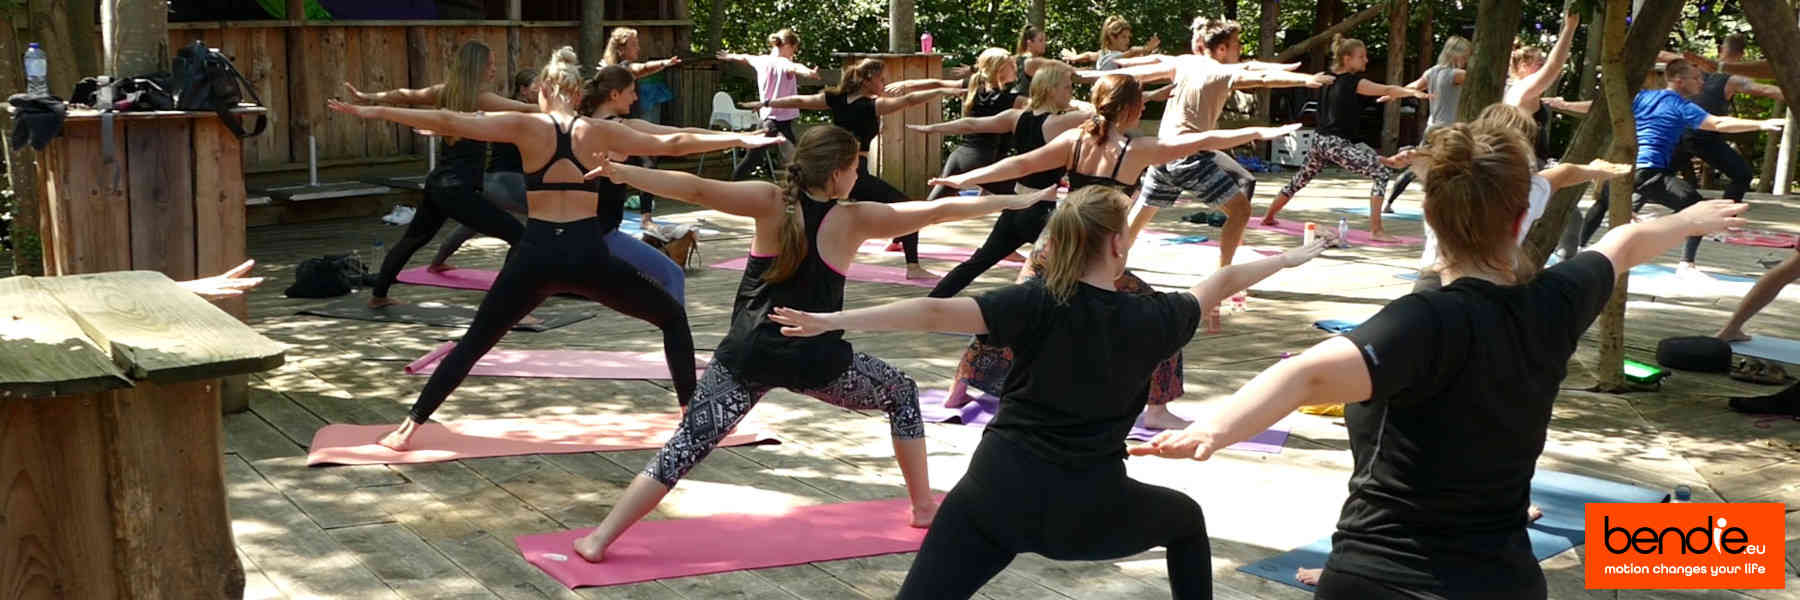 Yoga in Leeuwarden bij Bendie. Virabhadrasana 2